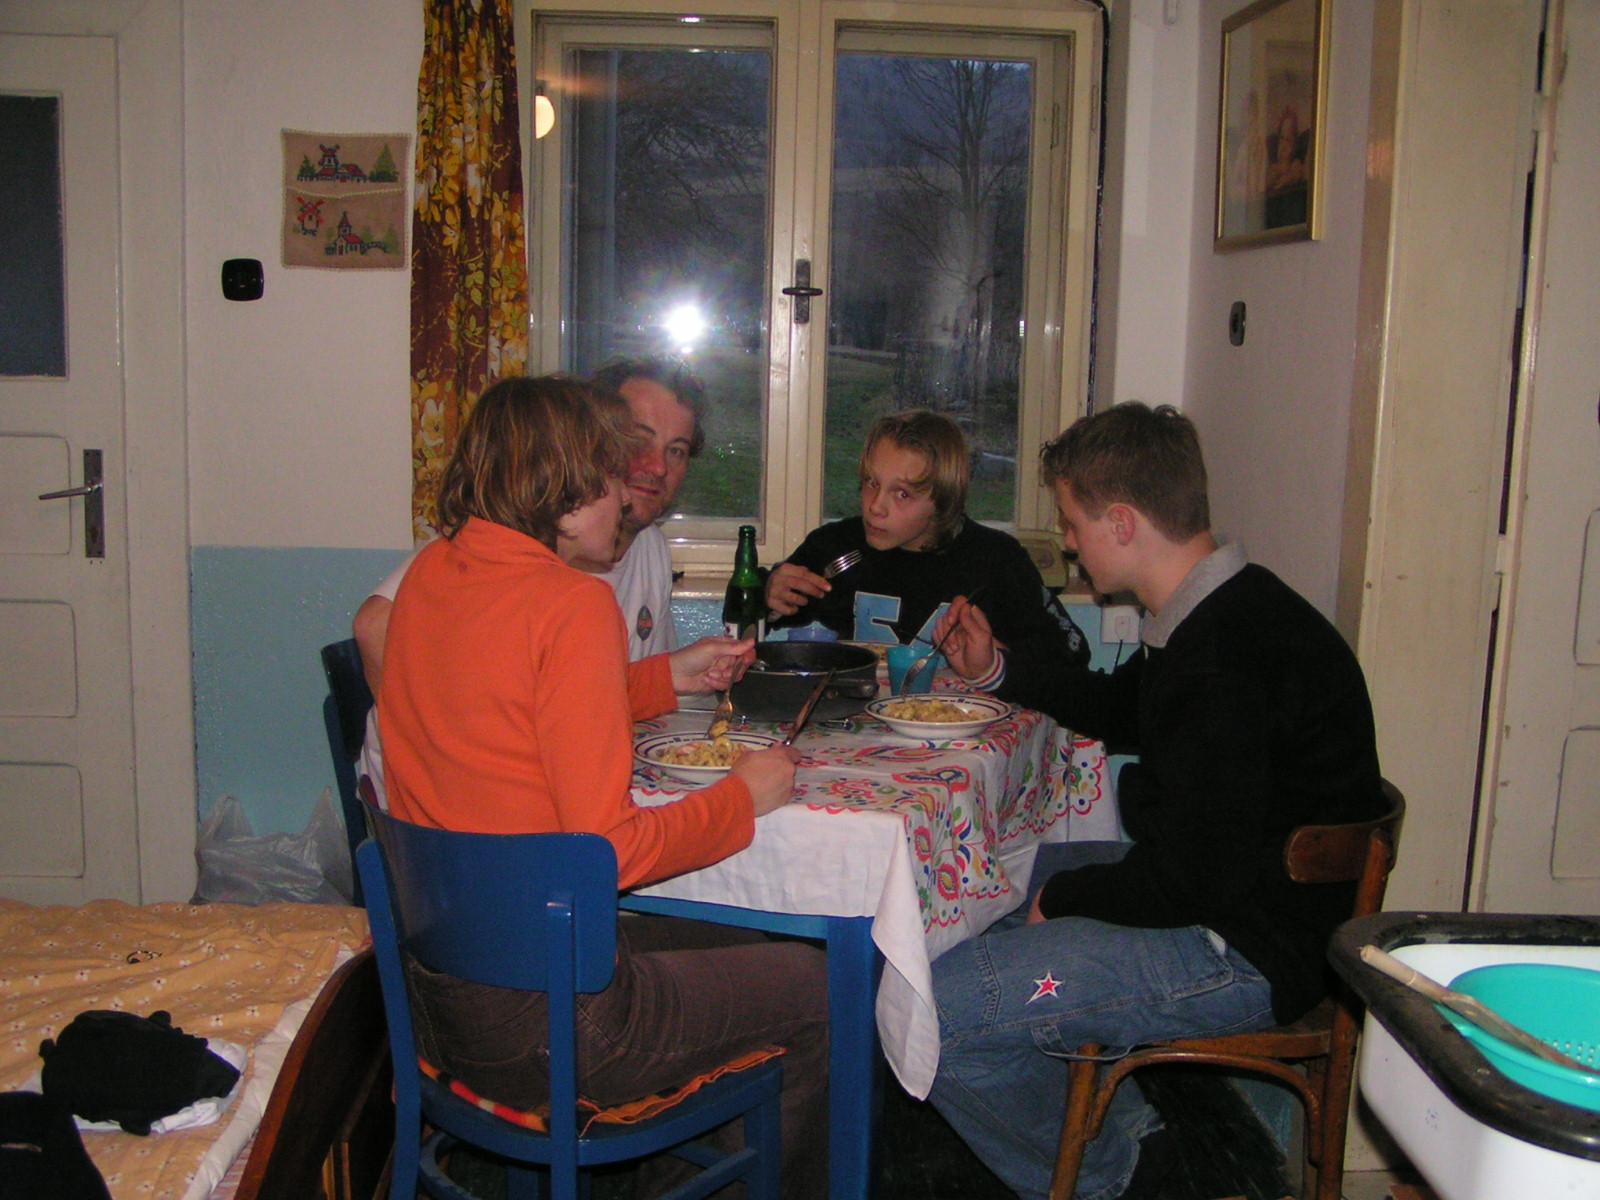 Het Boerenhof, camping & vakantiewoning Slowakije: april 2016